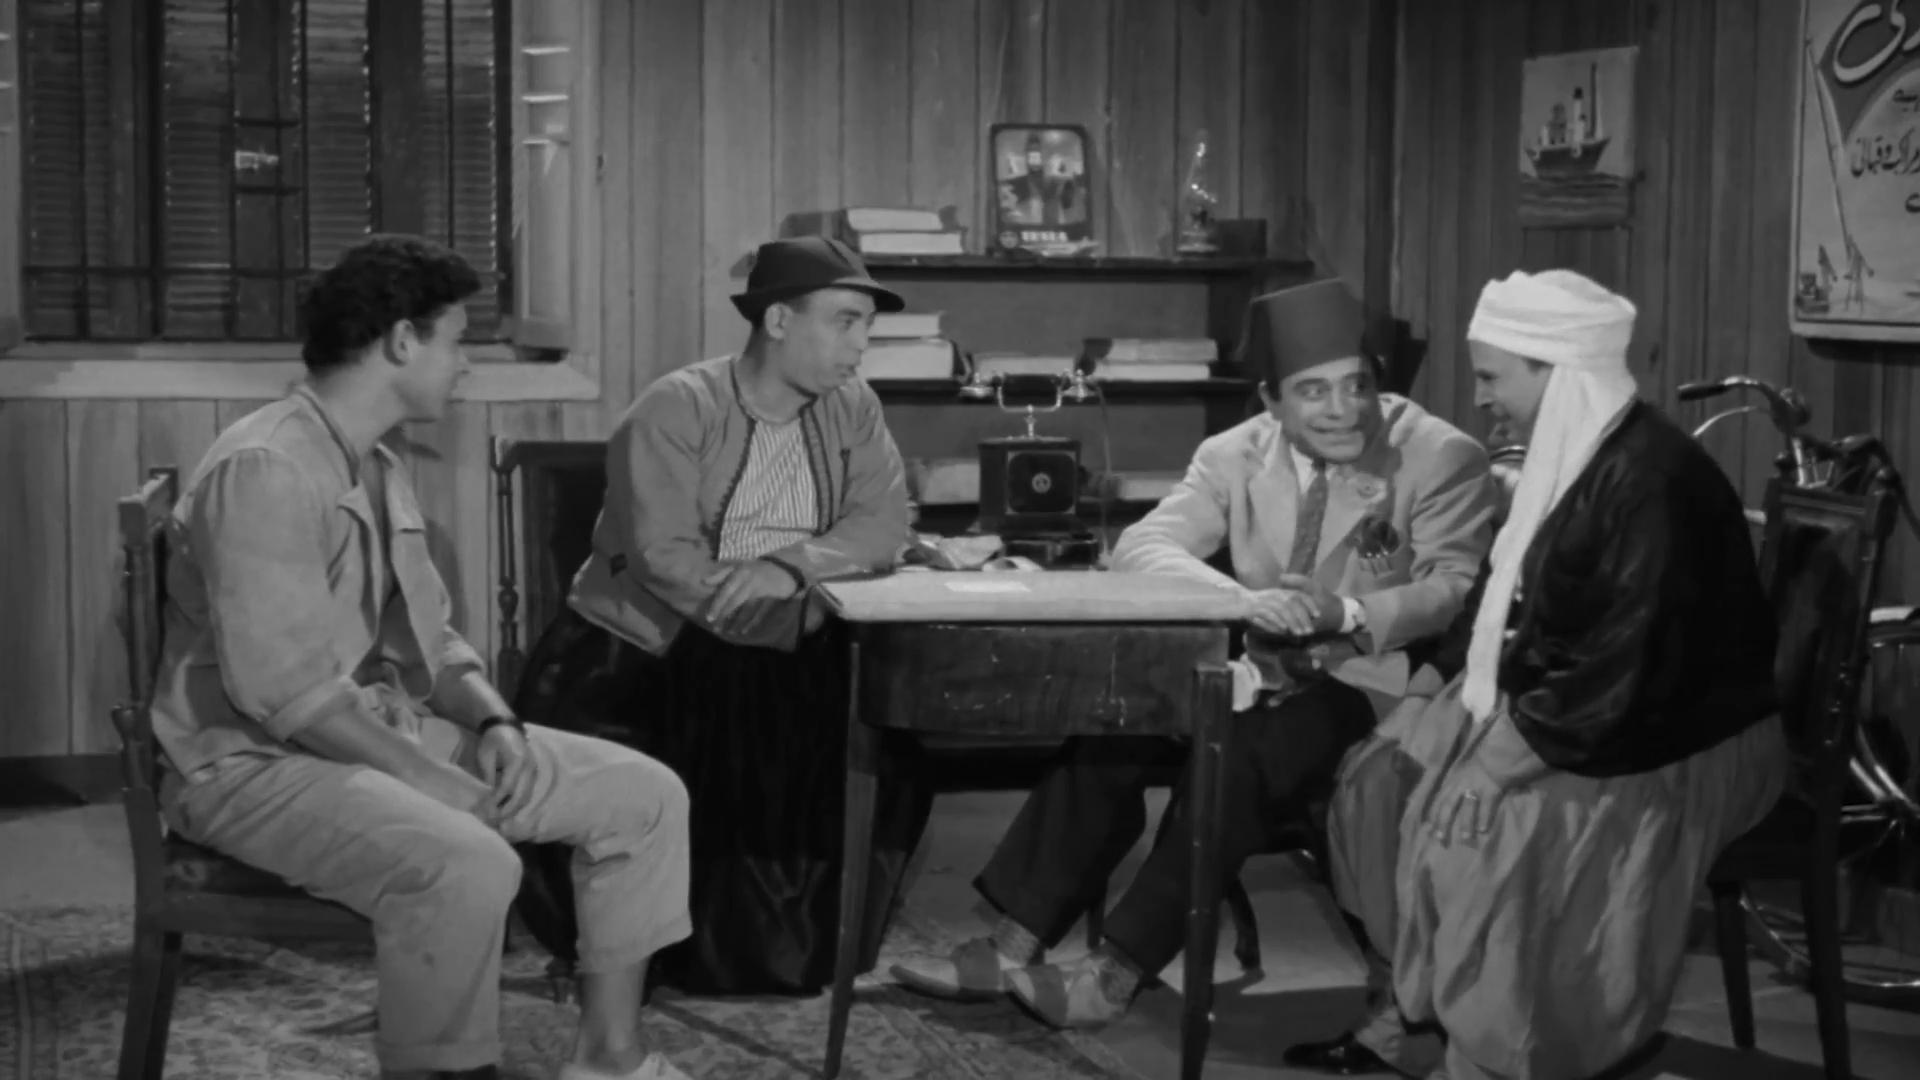 [فيلم][تورنت][تحميل][ابن حميدو][1957][1080p][Web-DL] 9 arabp2p.com